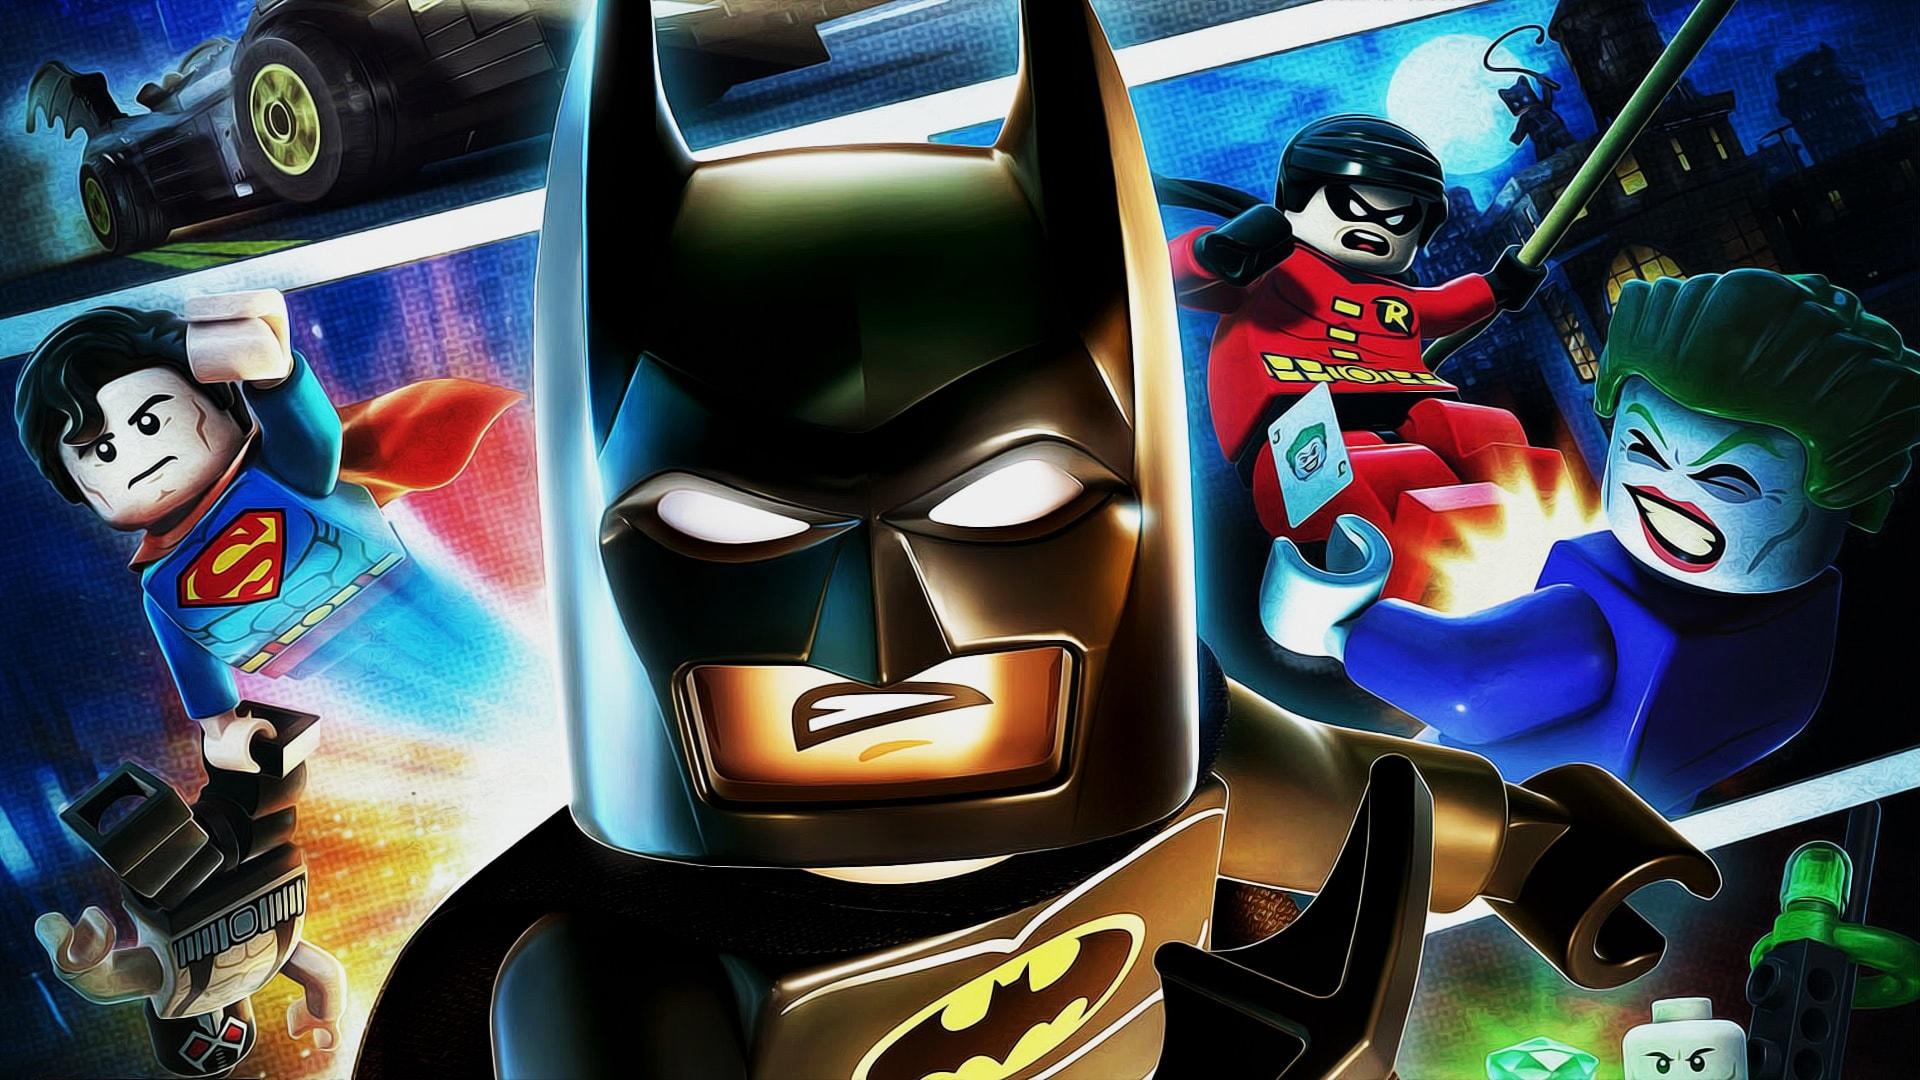 The Lego Movie Free